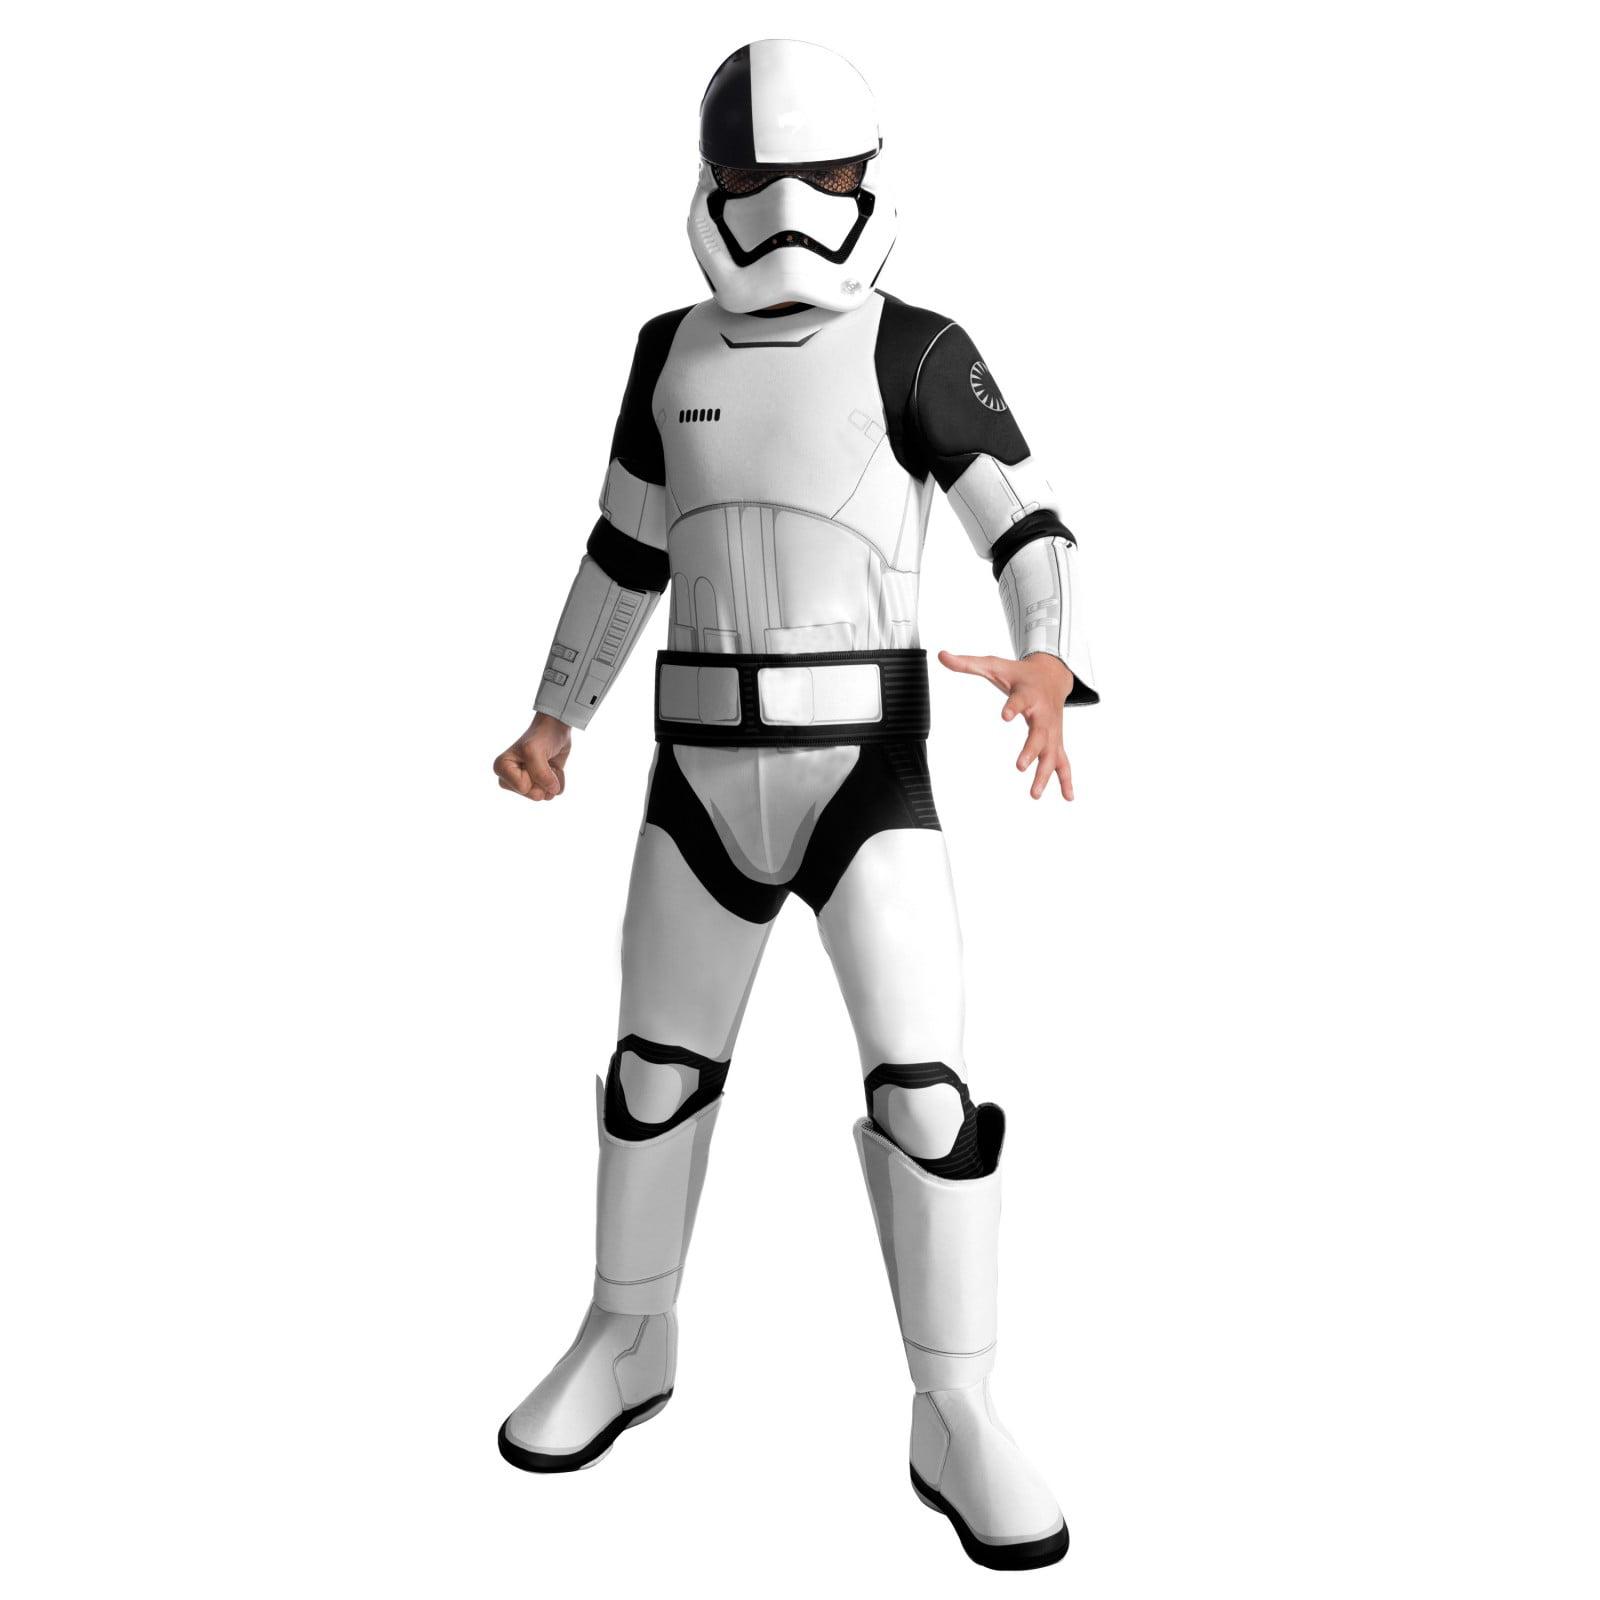 Star Wars Episode VIII - The Last Jedi Deluxe Child Executioner Trooper Costume